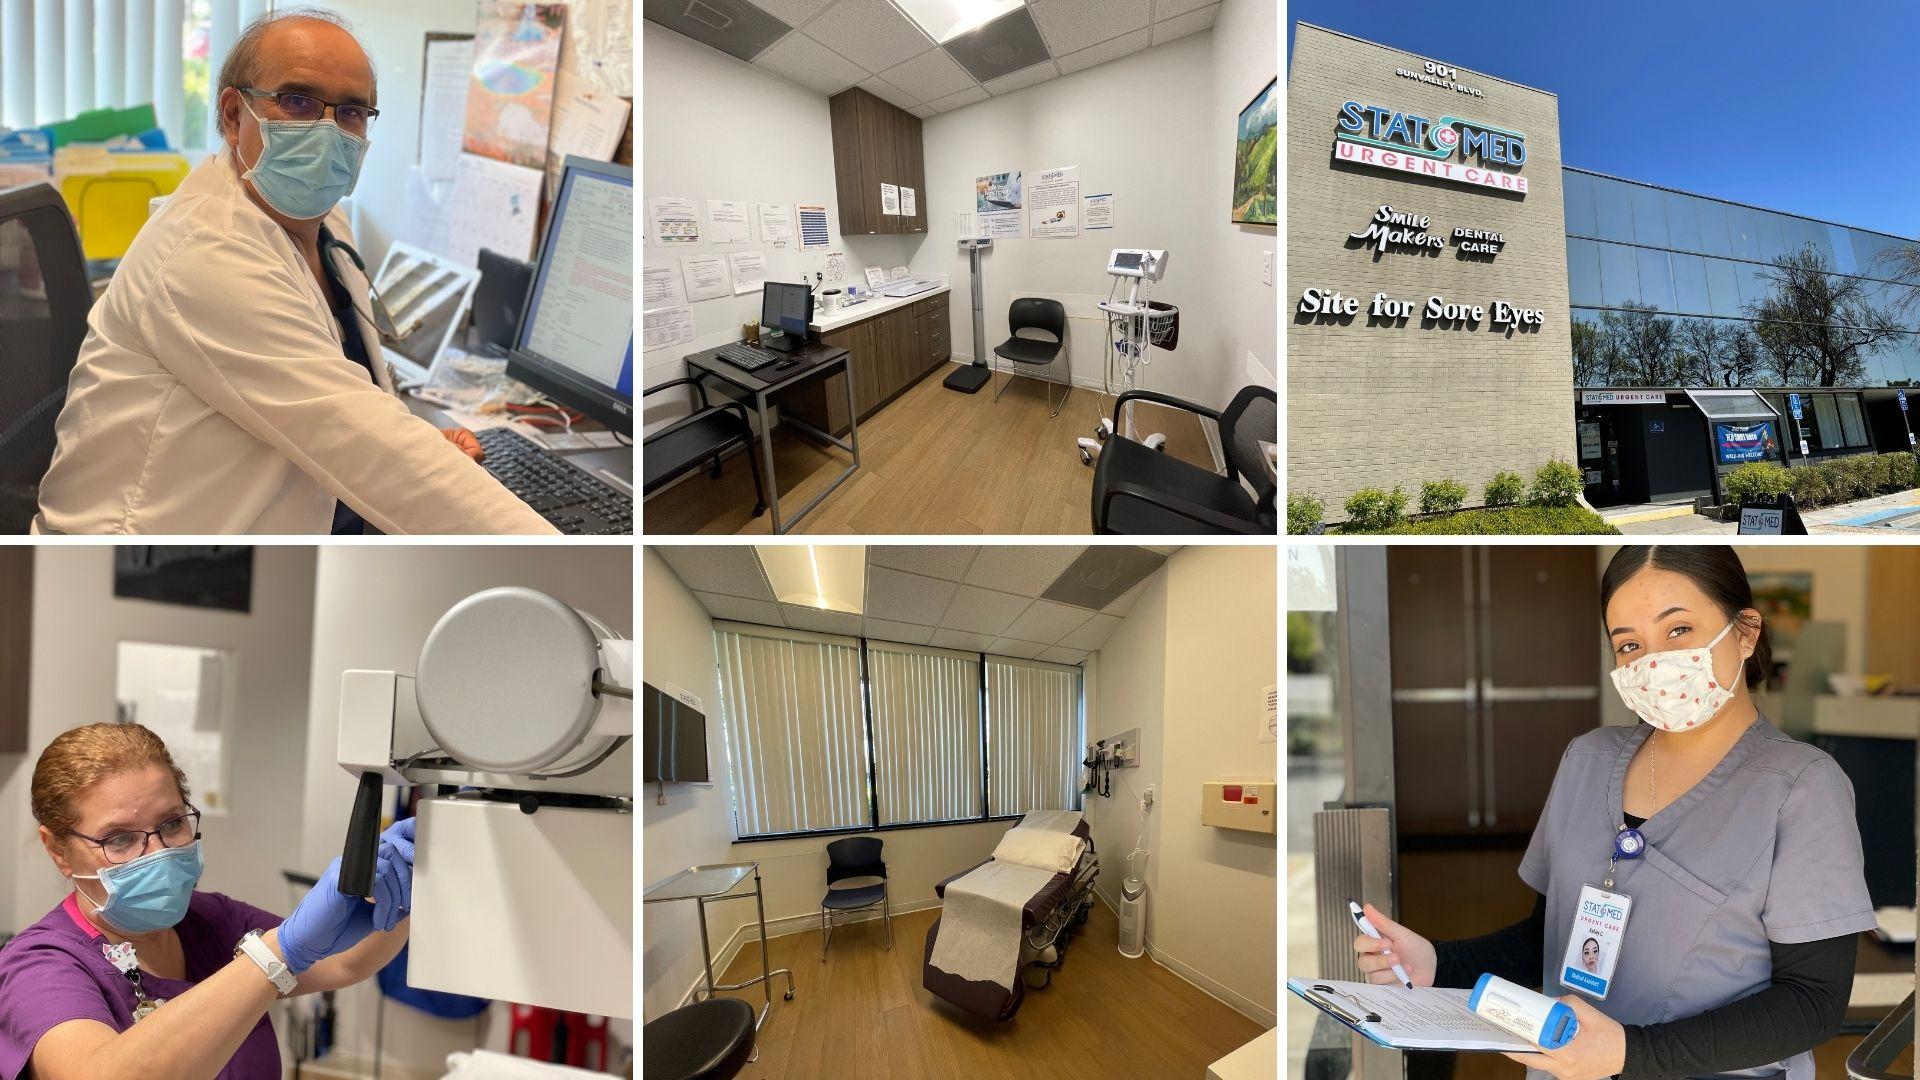 STAT MED Urgent Care - Concord CA - Collage